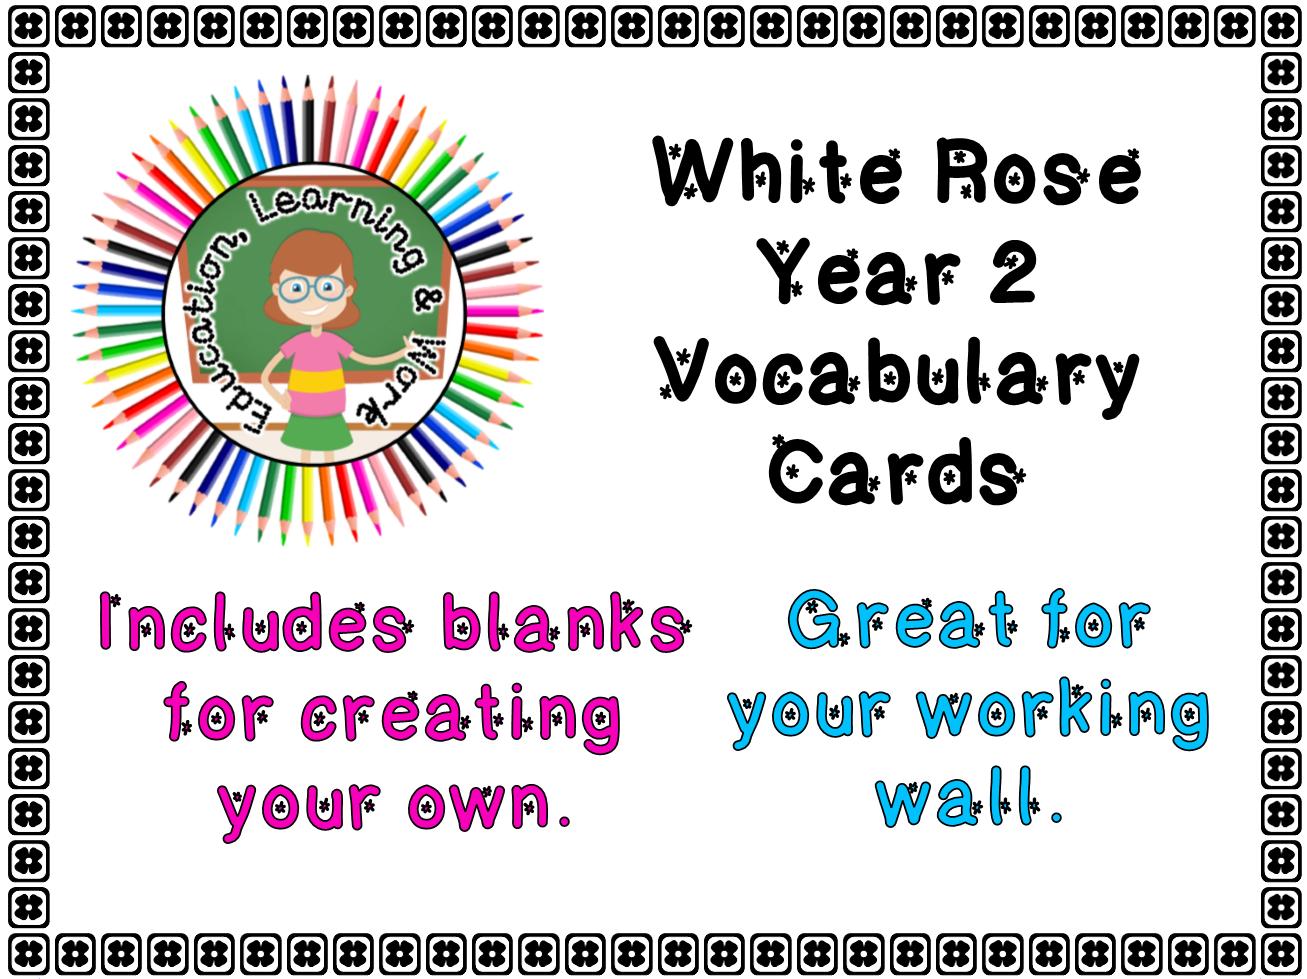 ***BUNDLE*** Maths Vocabulary Cards - Year 2 White Rose - Full Year